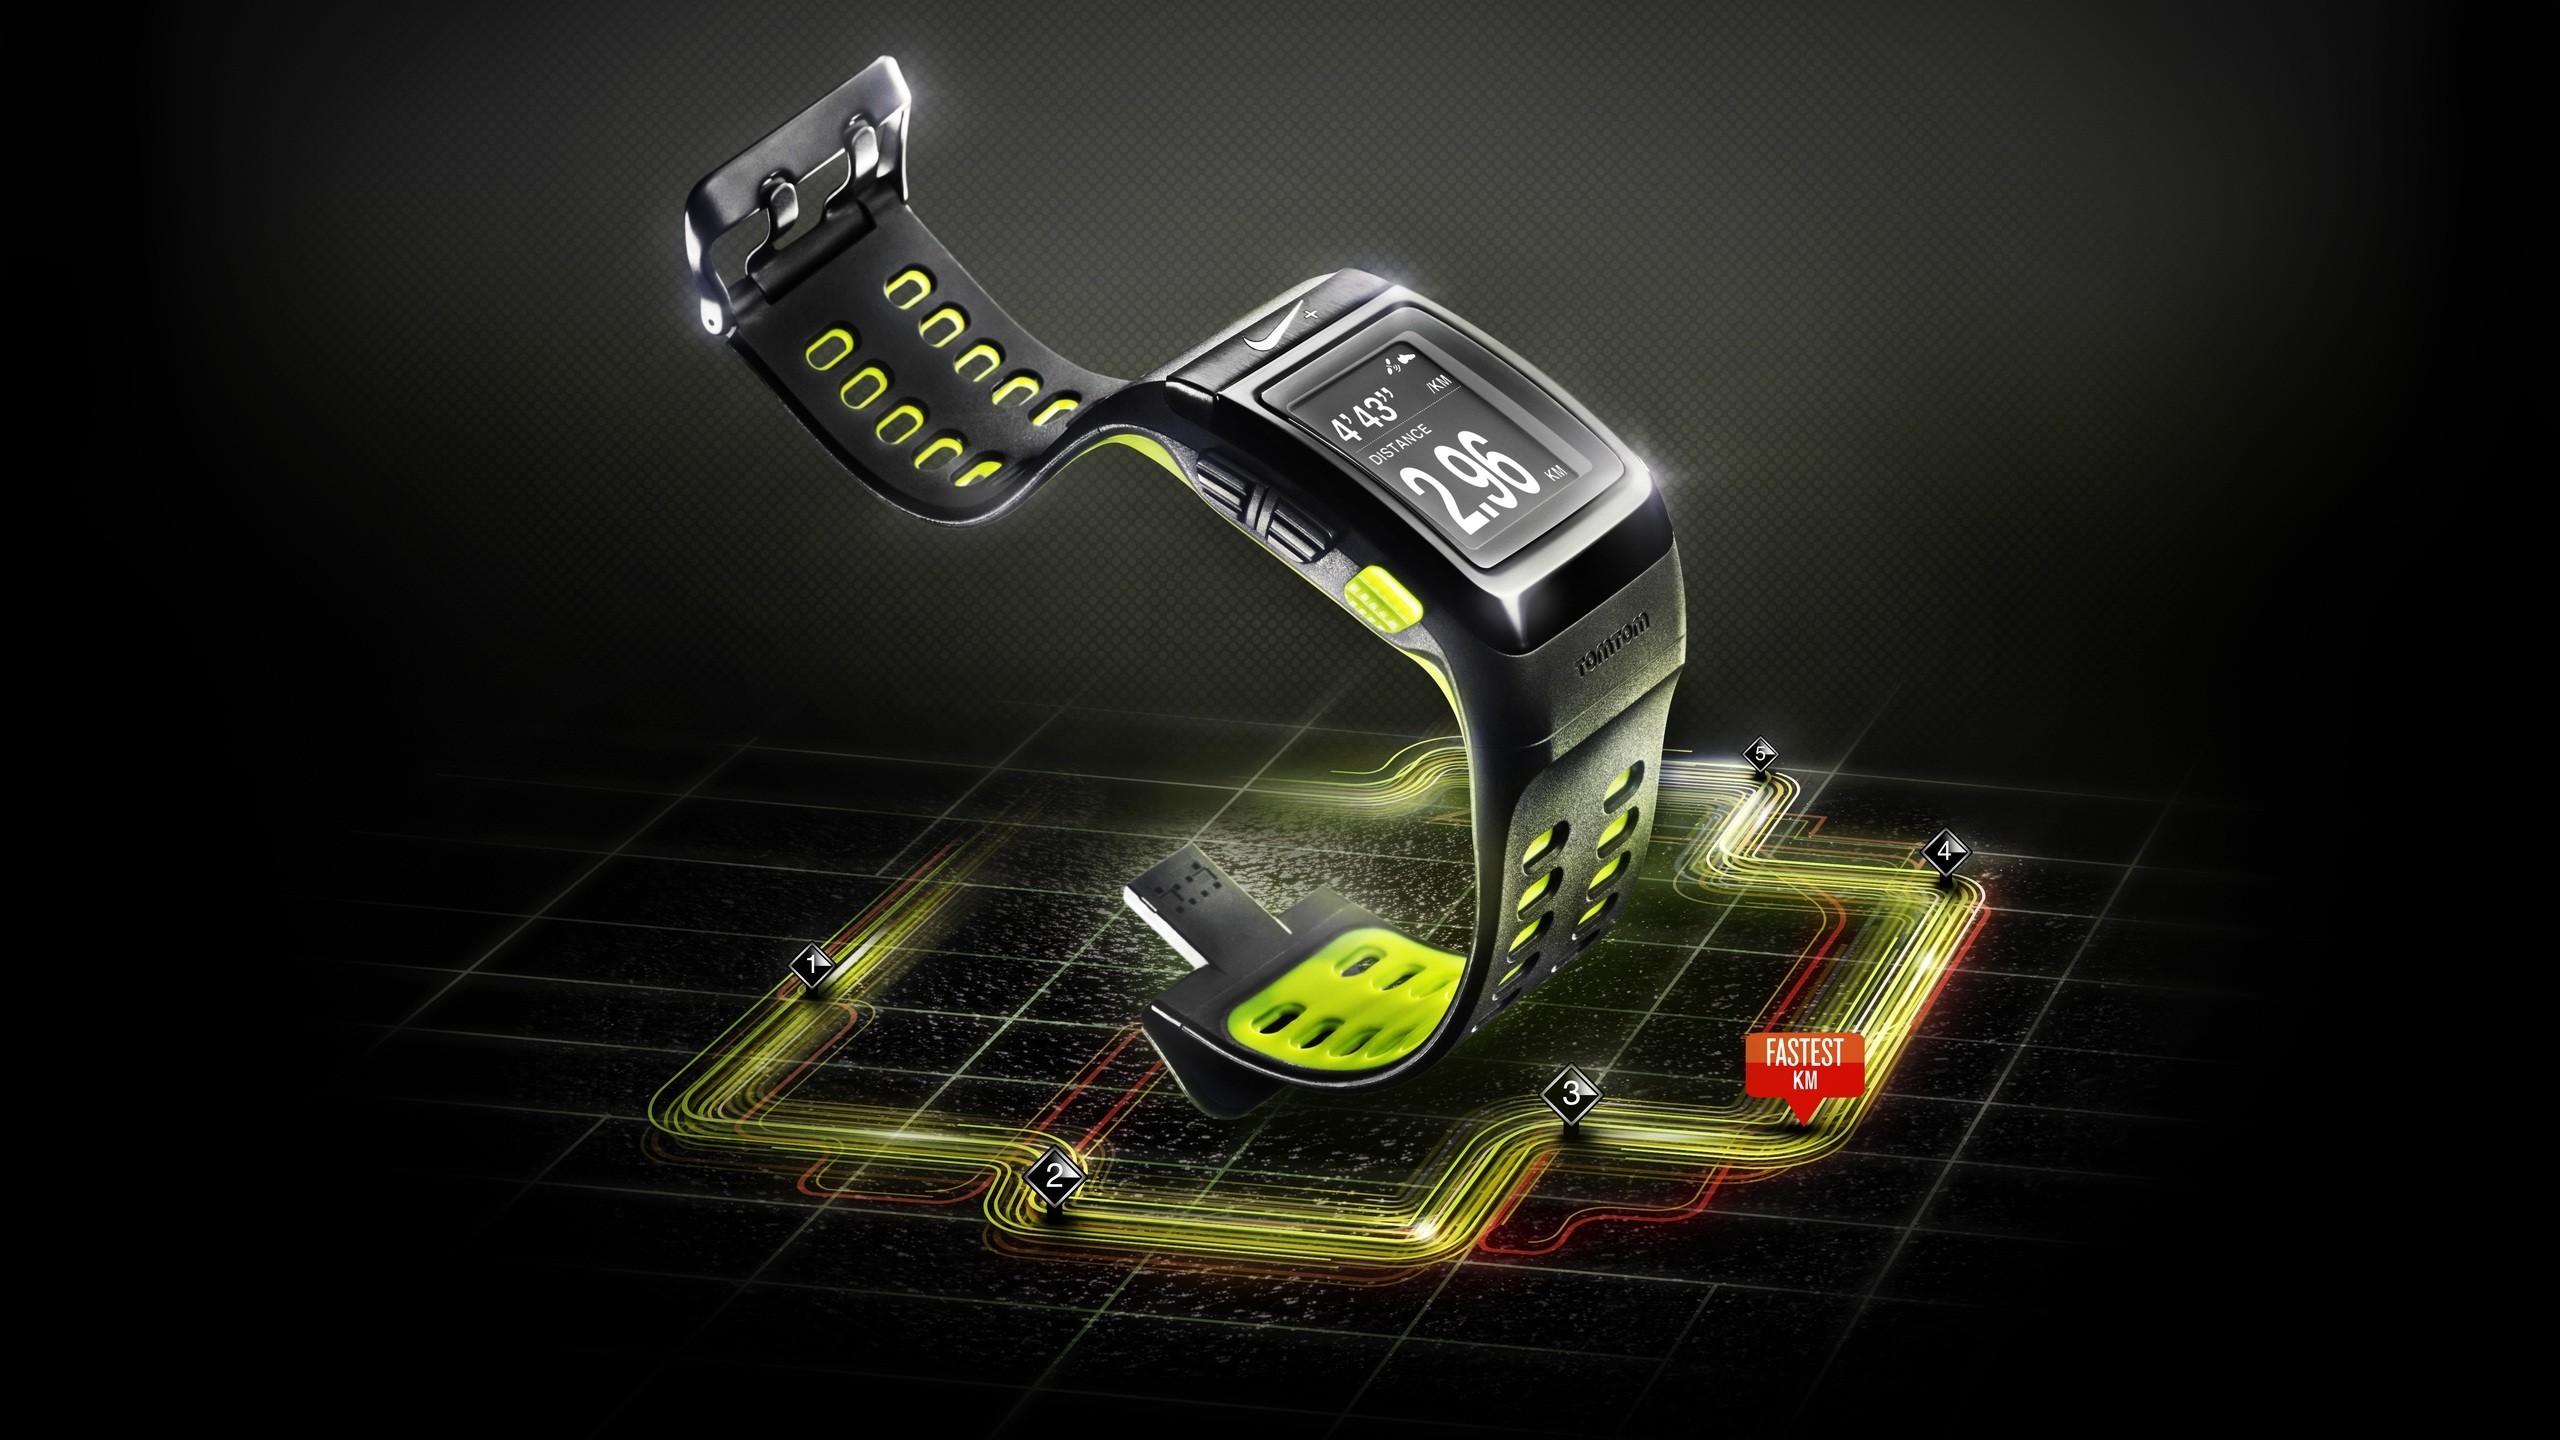 Technology Nike Digital Art Fresh New HD Wallpaper Best Quality